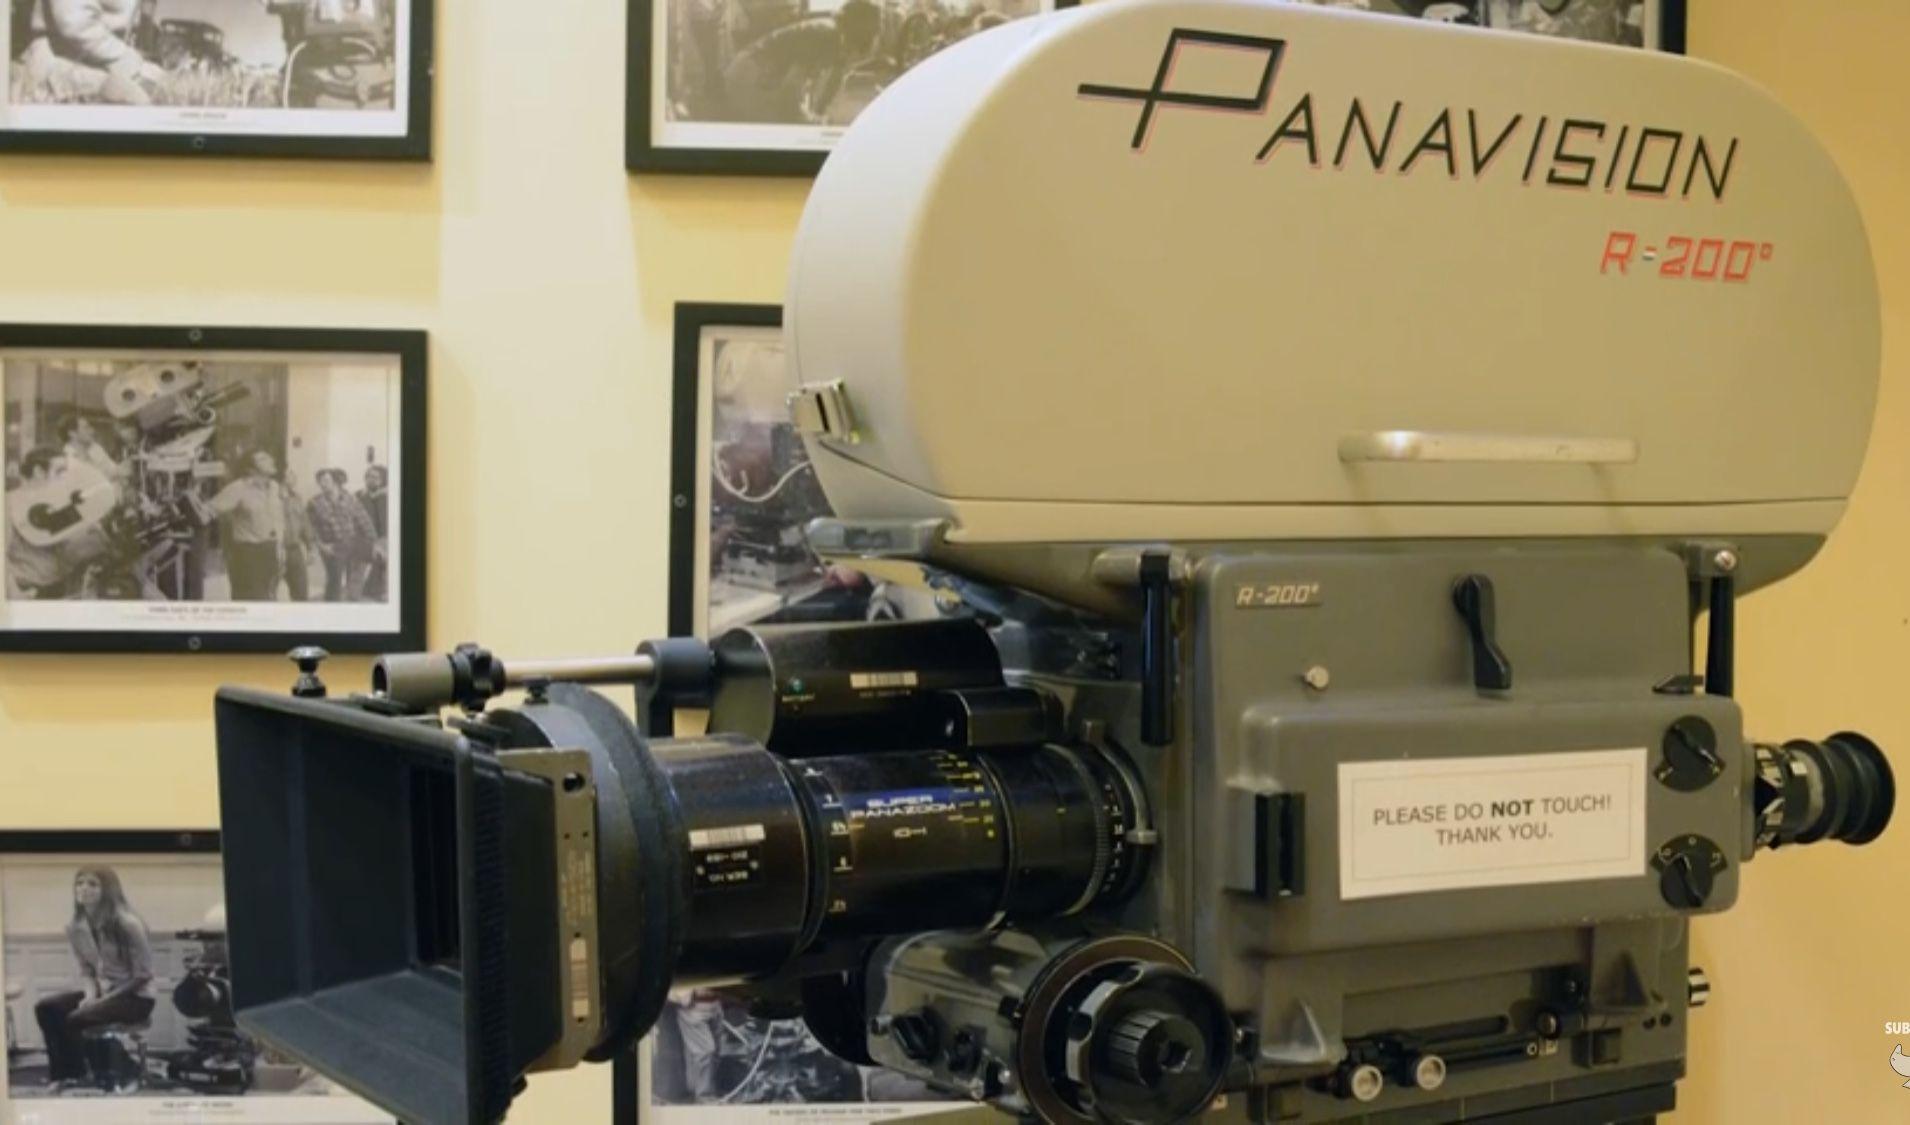 Panavision Camera Star Wars : George lucas panavision camera used to film star wars in